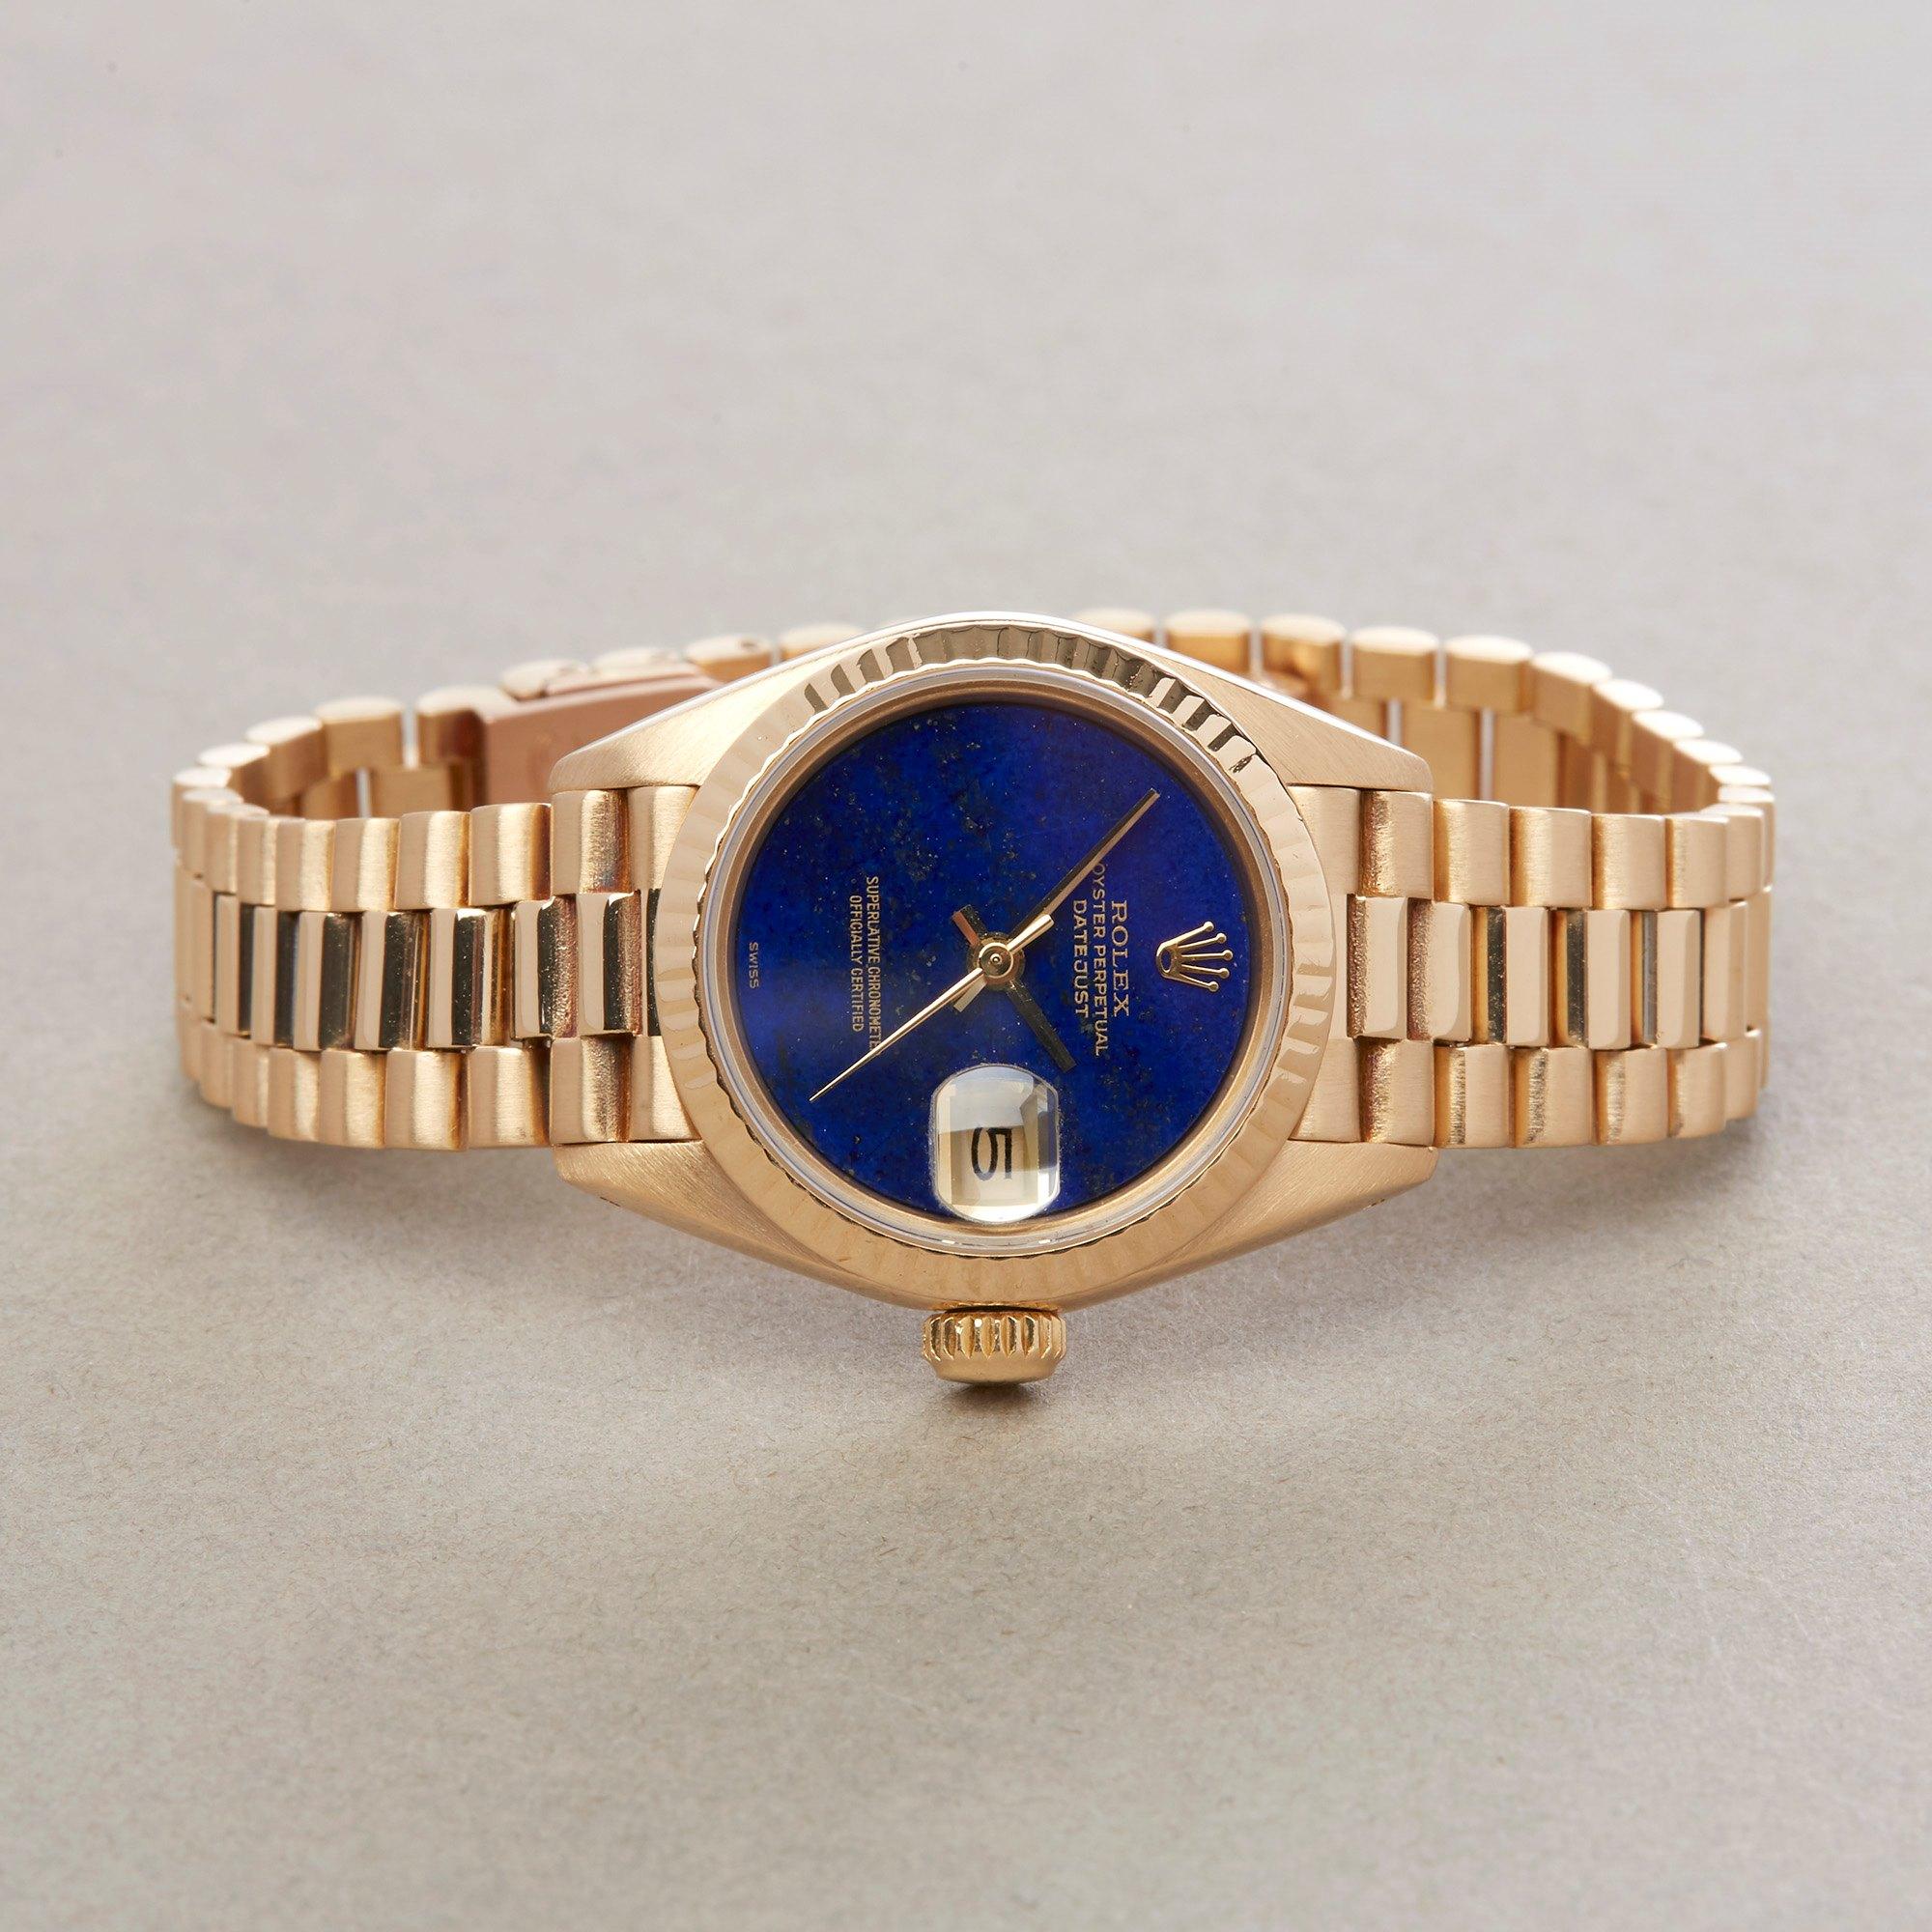 Rolex Datejust 26 Lapis Lazuli 18K Yellow Gold 69178